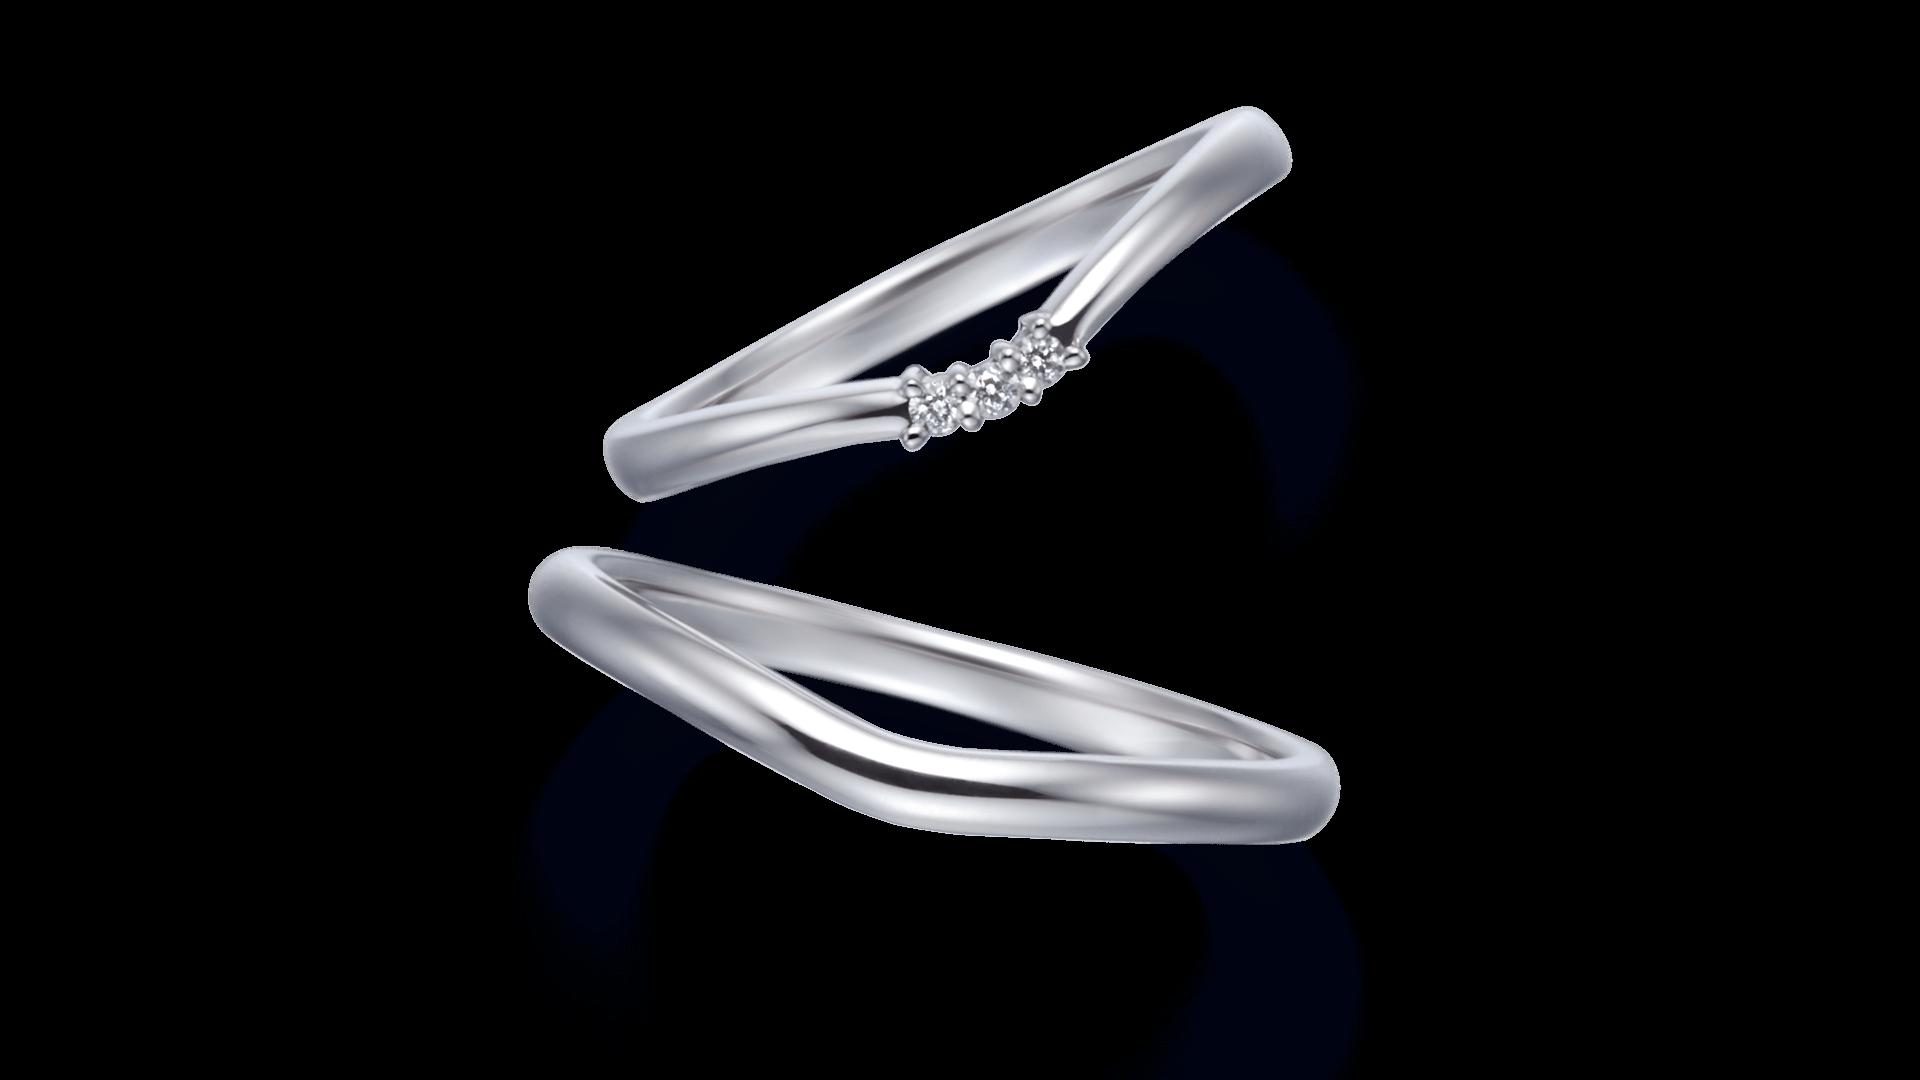 napaea ナパイア | 結婚指輪サムネイル 2